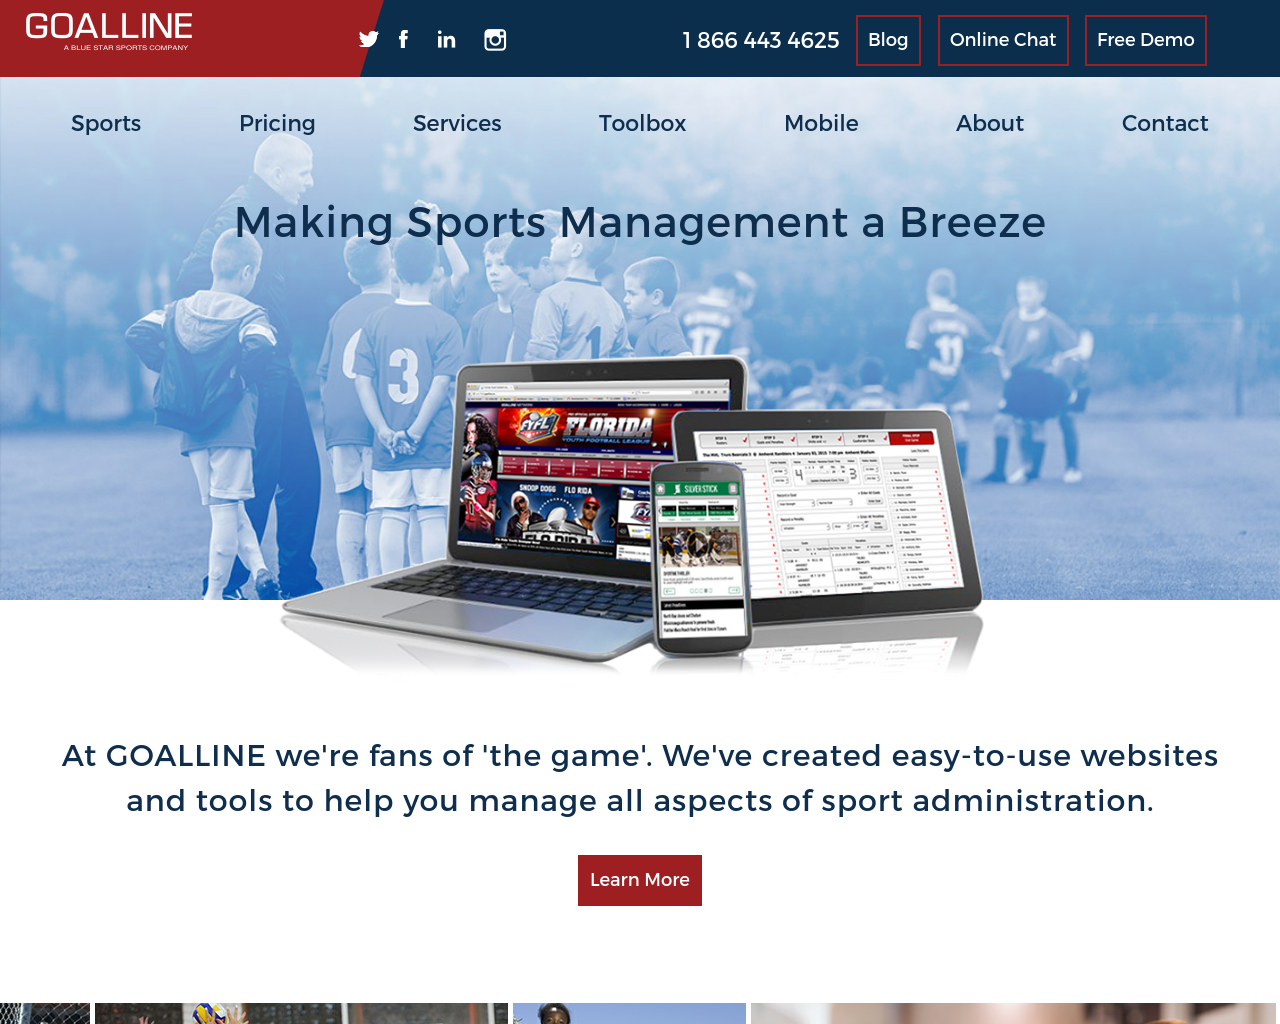 Goalline-Advertising-Reviews-Pricing